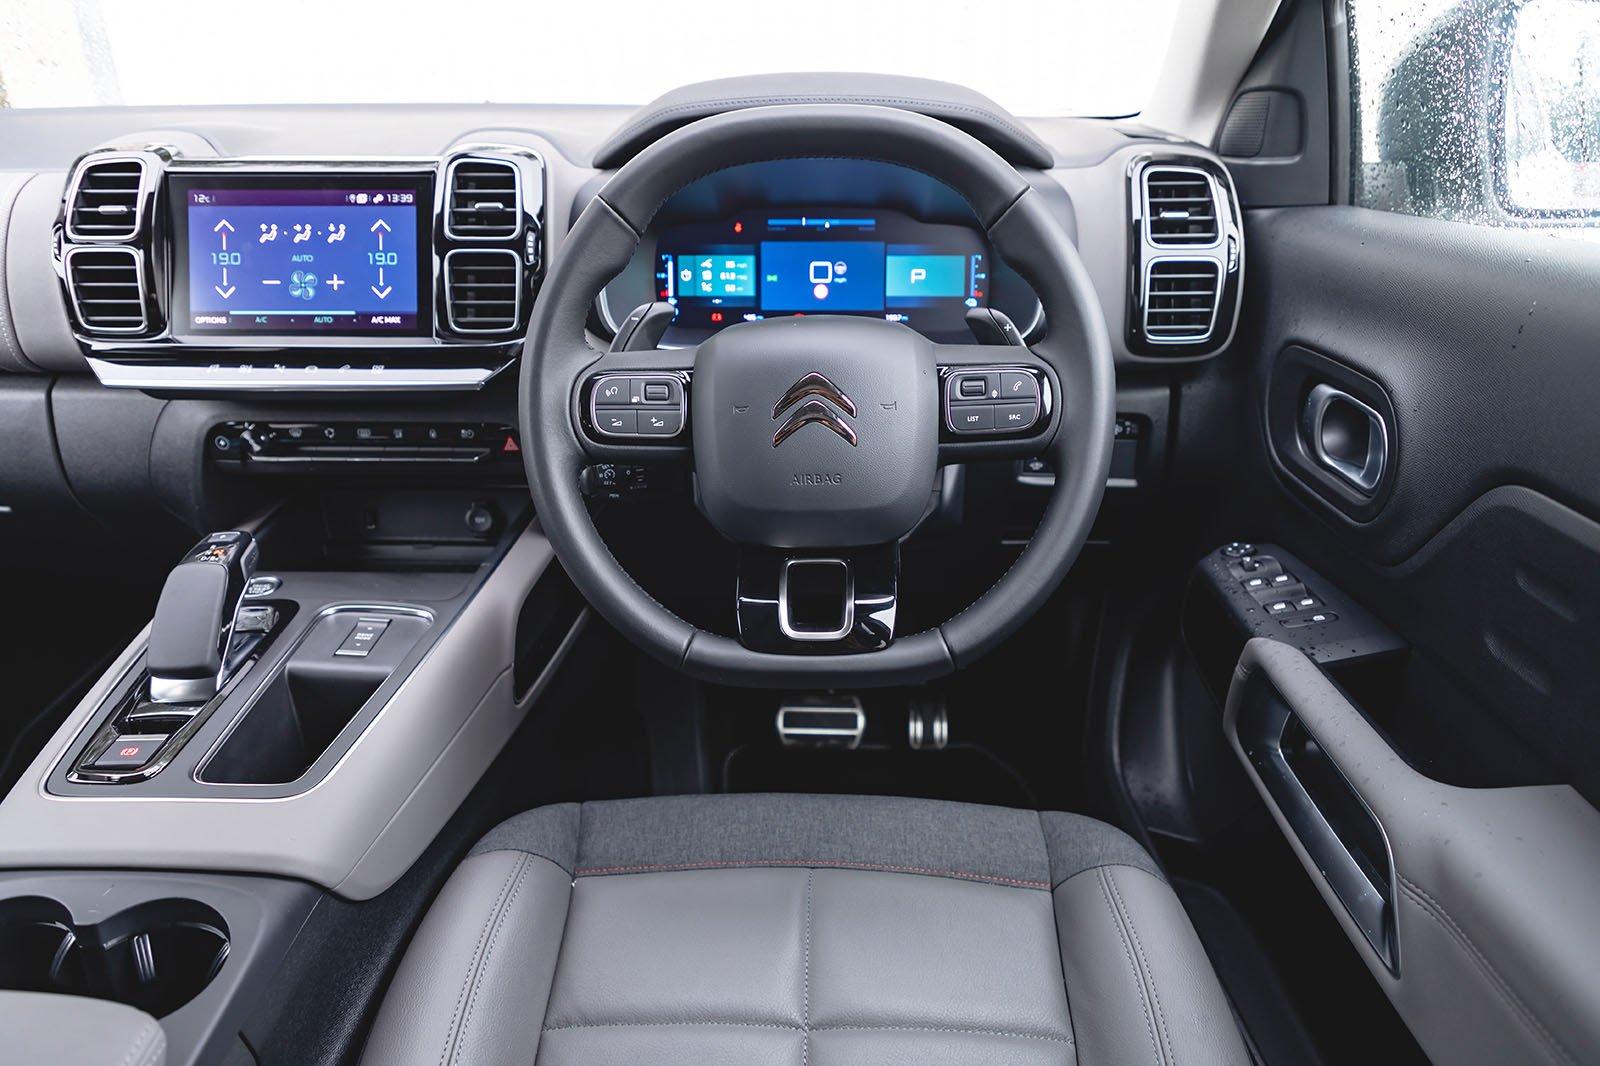 Citroën C5 Aircross 2020 dashboard